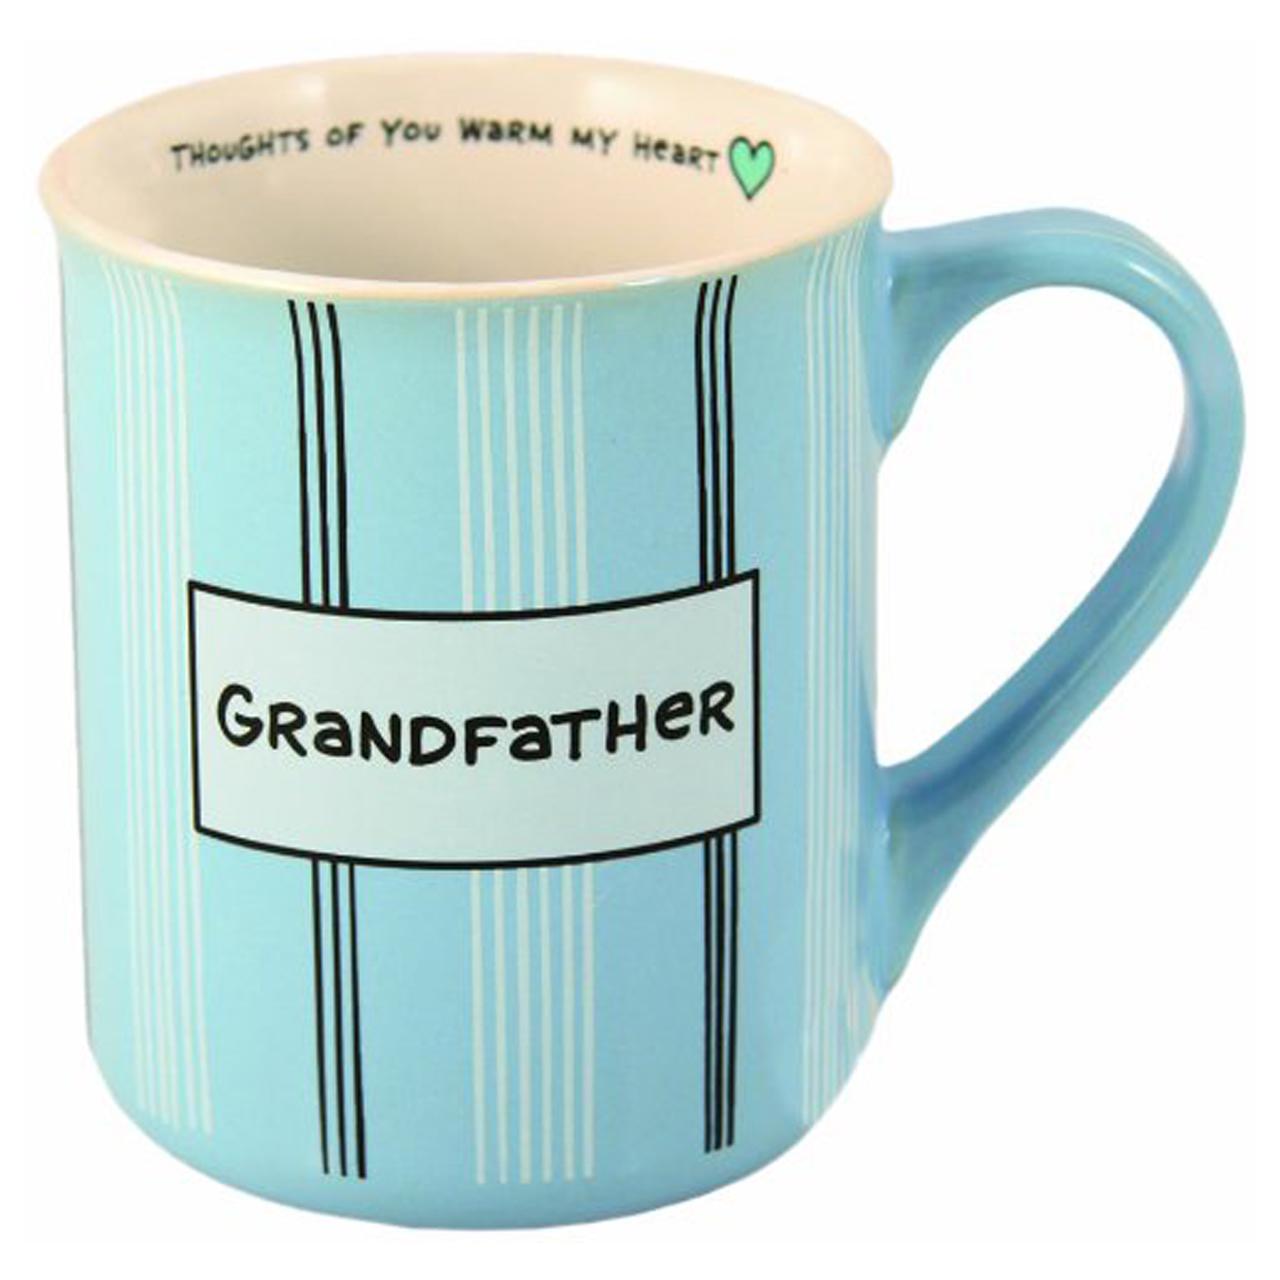 عکس ماگ حرارتی آور نیم ایز ماد مدل Grandfather